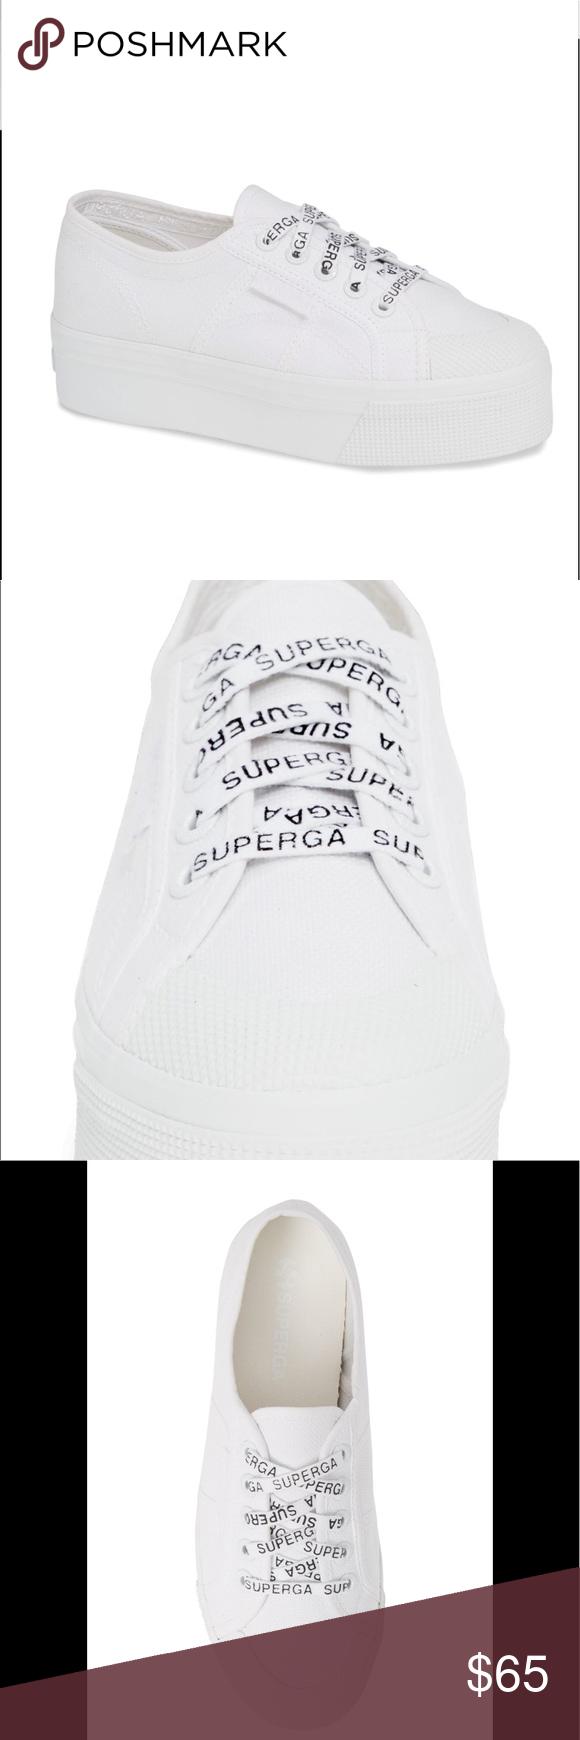 SUPERGA 2405 cotu platform sneaker